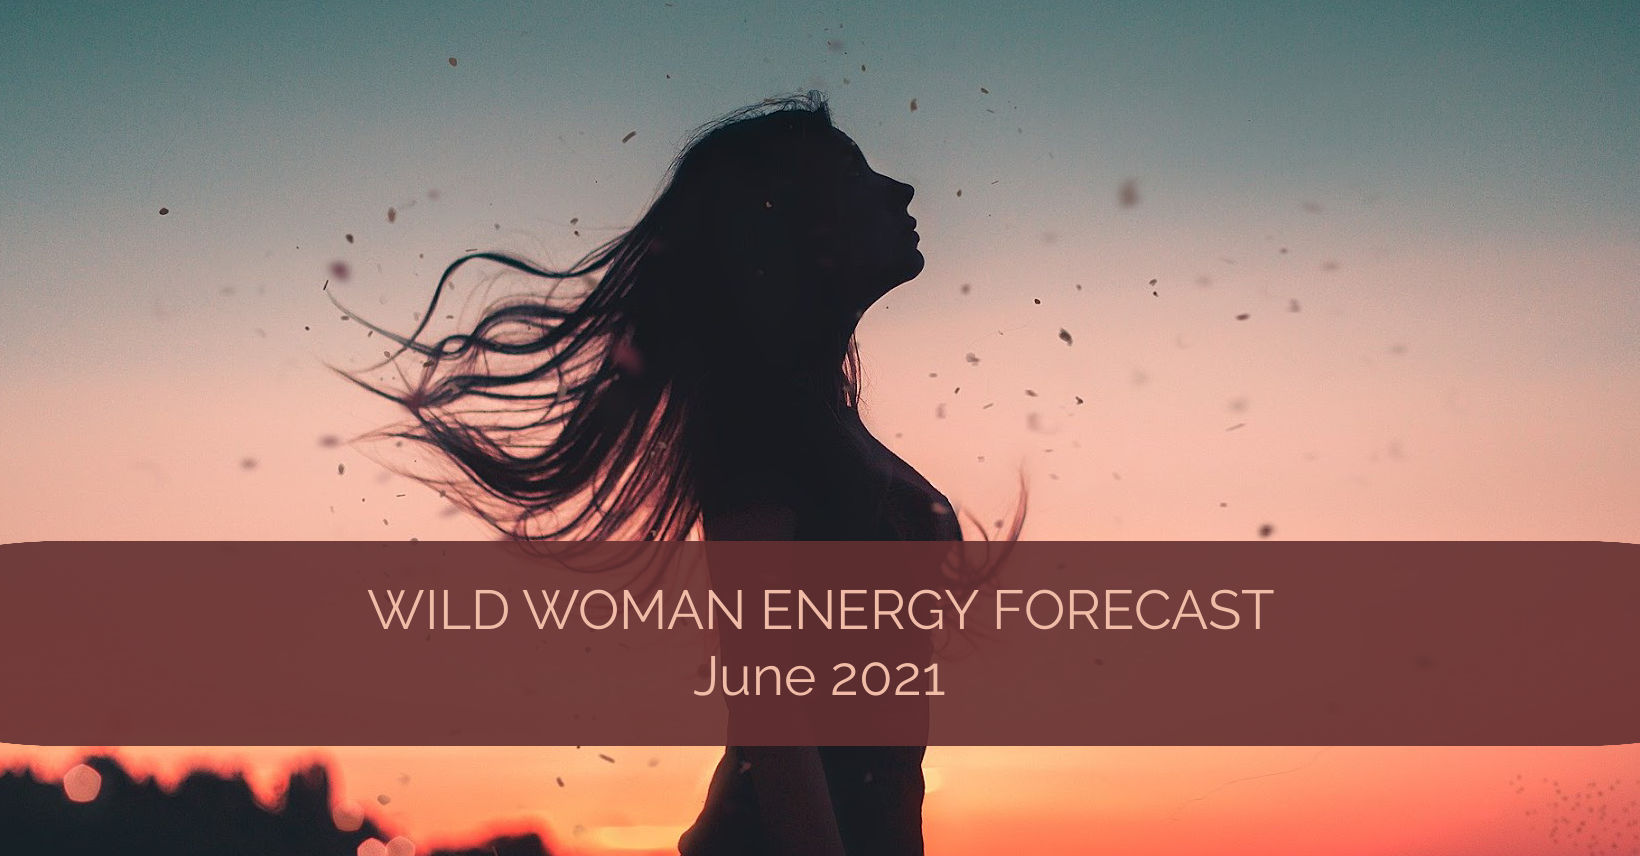 Wild Woman Energy Forecast June 2021